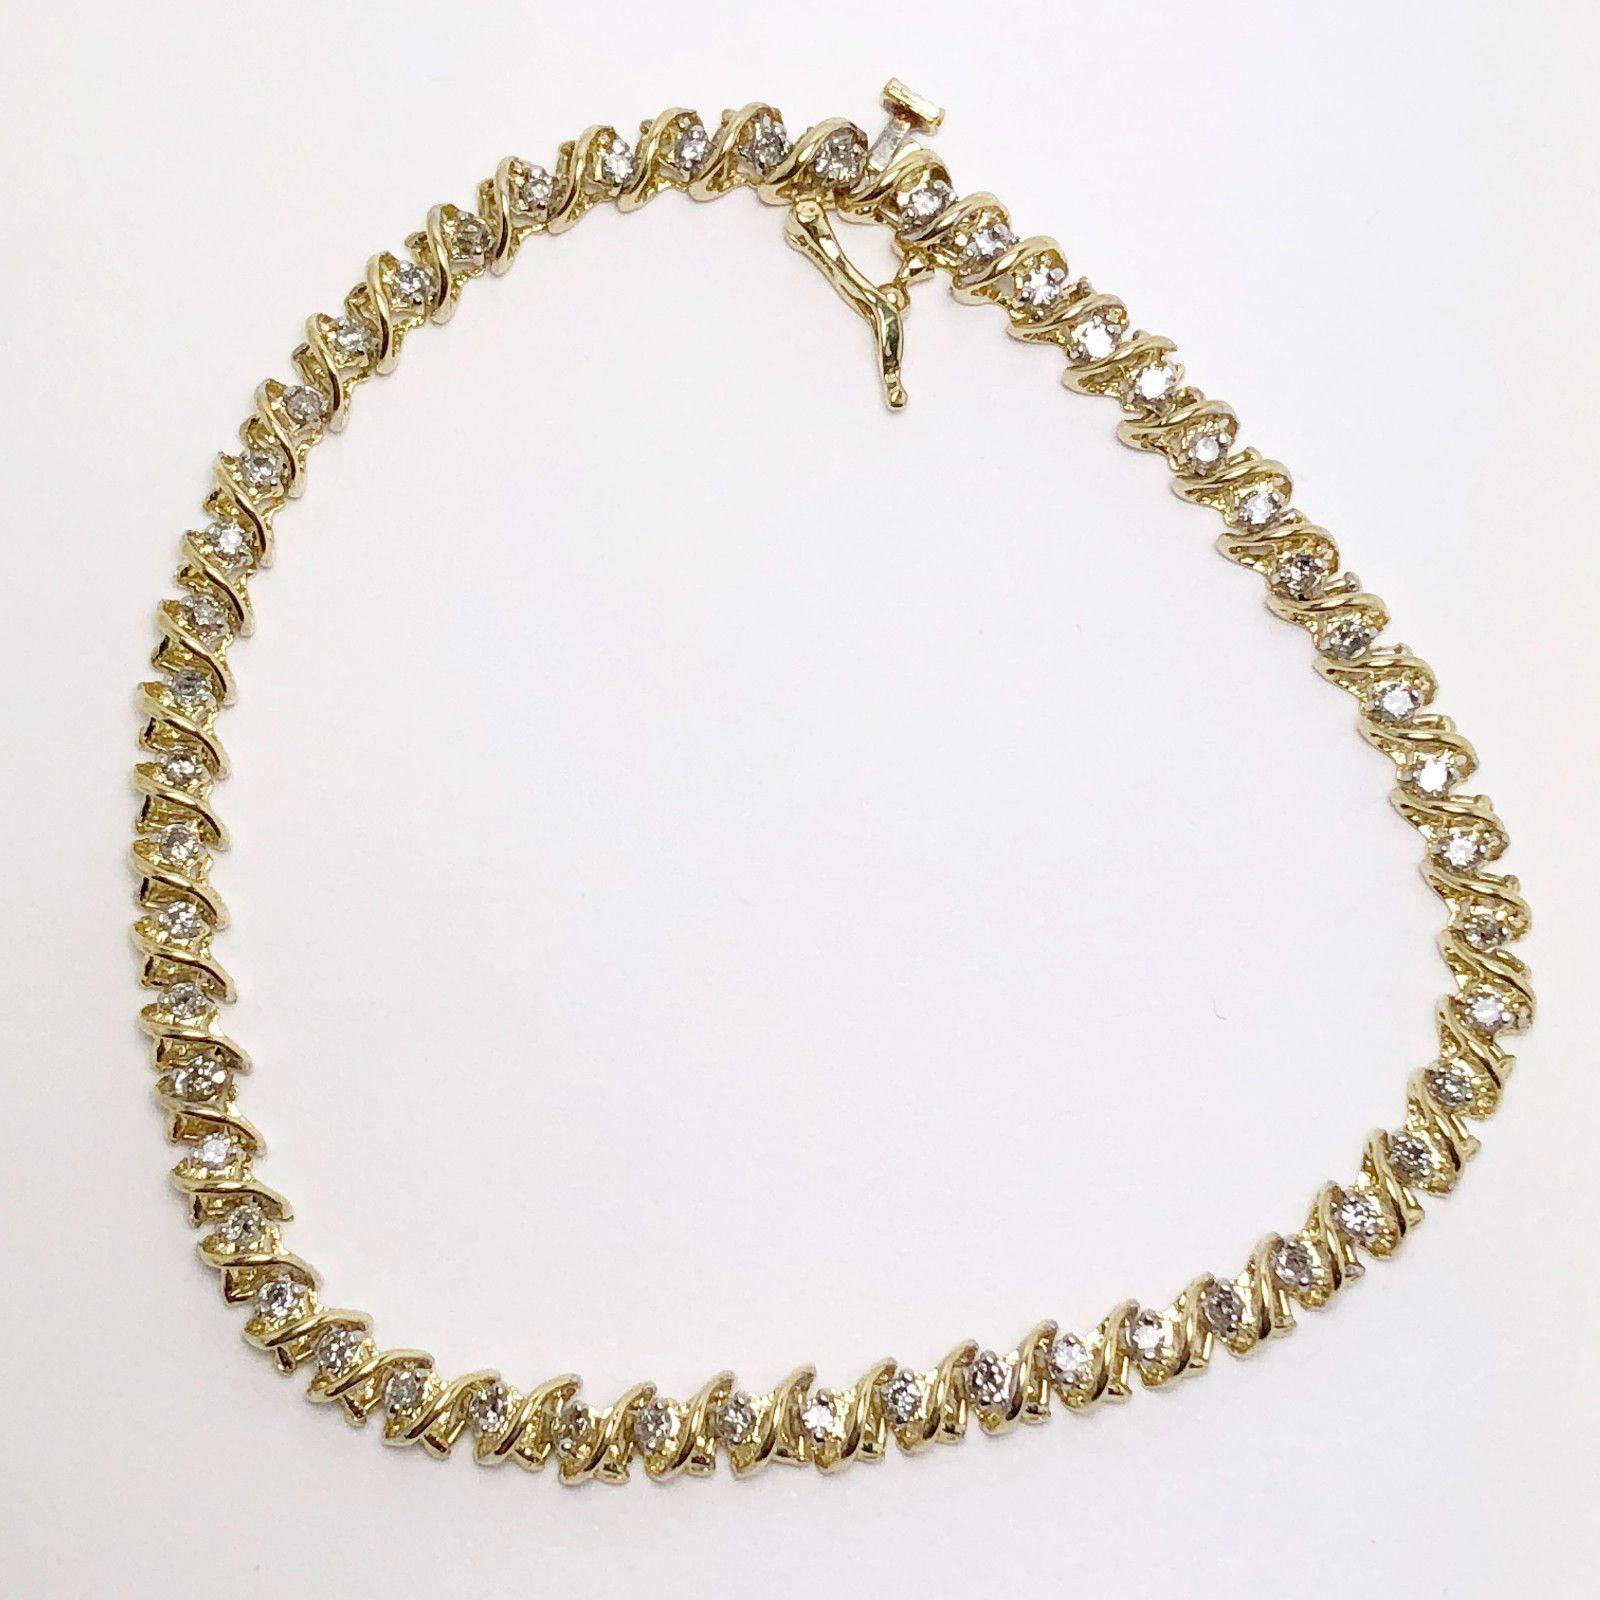 Slightly Used 1Ctw Diamond 14K Gold Spiral Link Tennis Bracelet